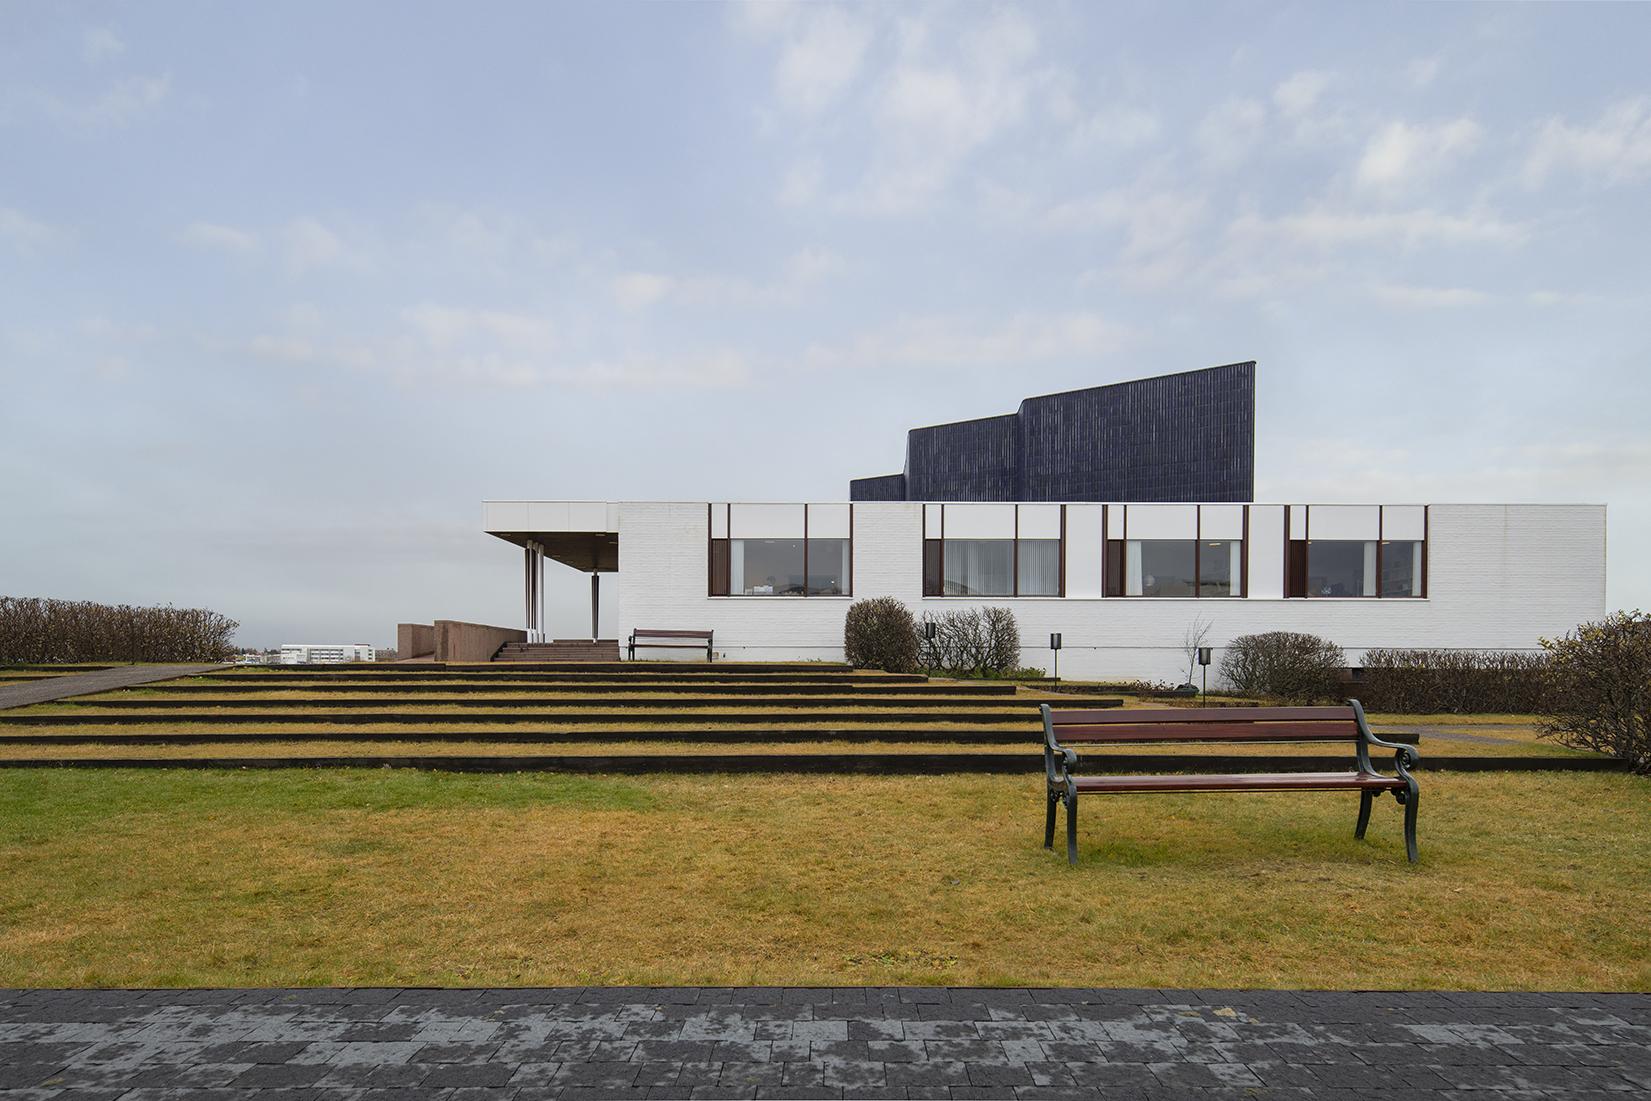 Iceland, House by Architect Alvar Aalto